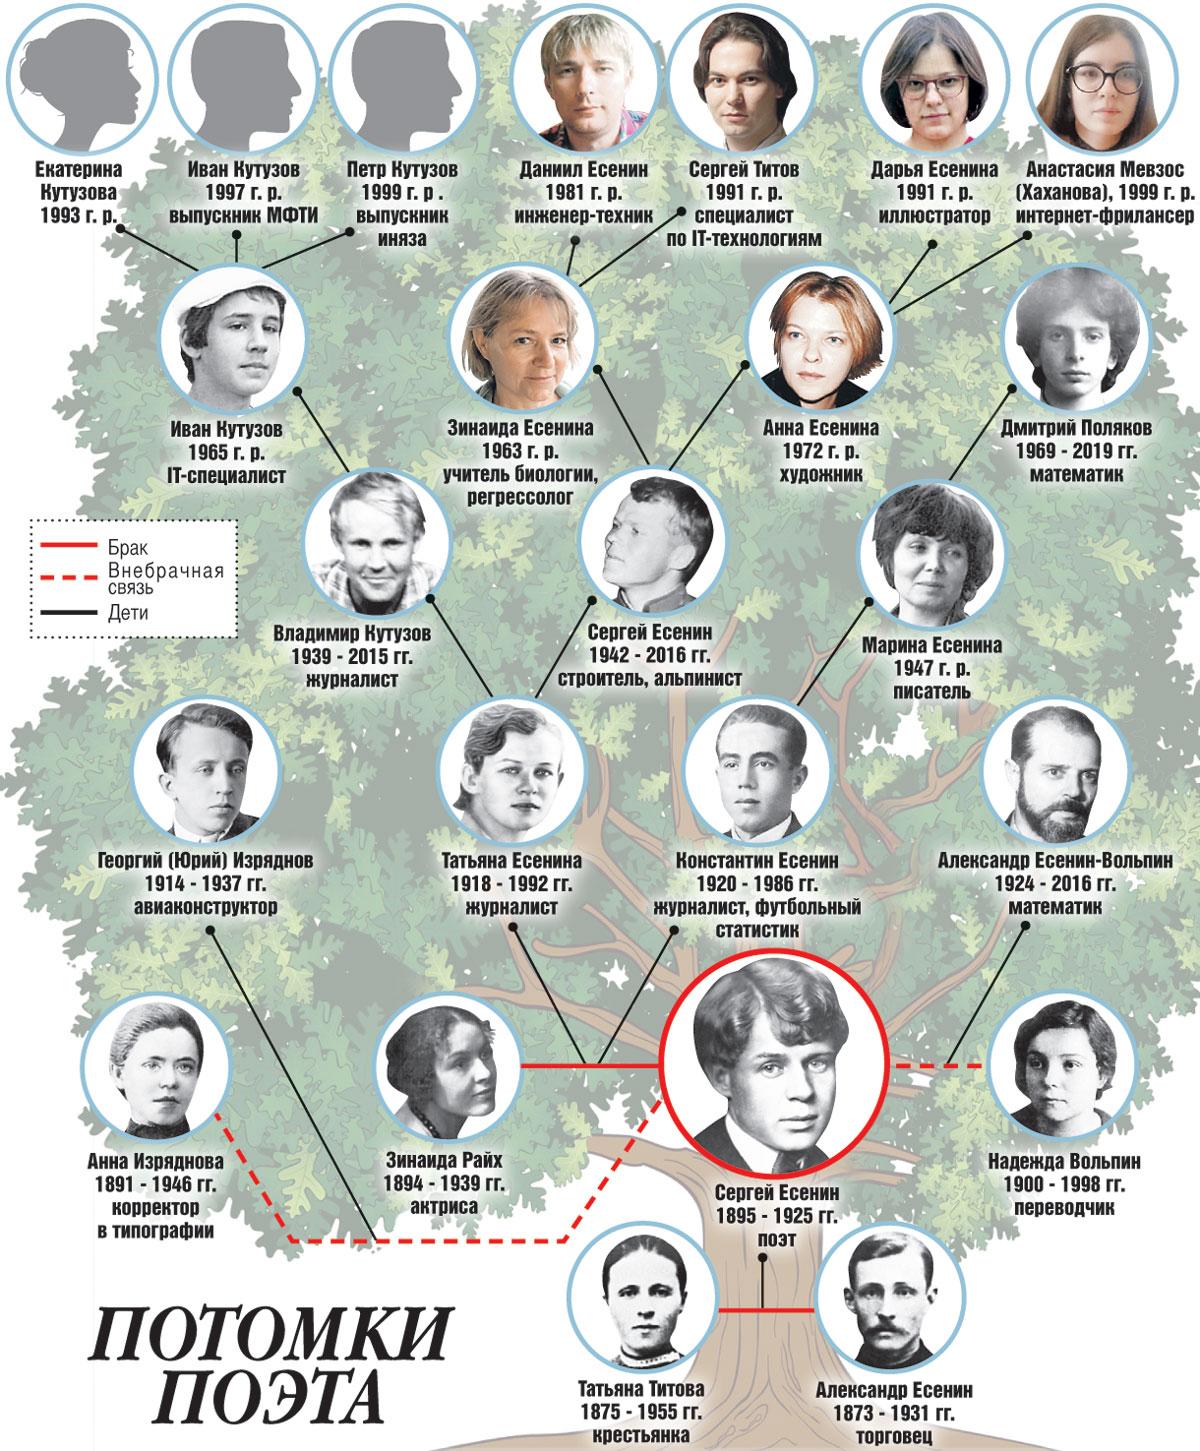 Потомки Сергея Есенина